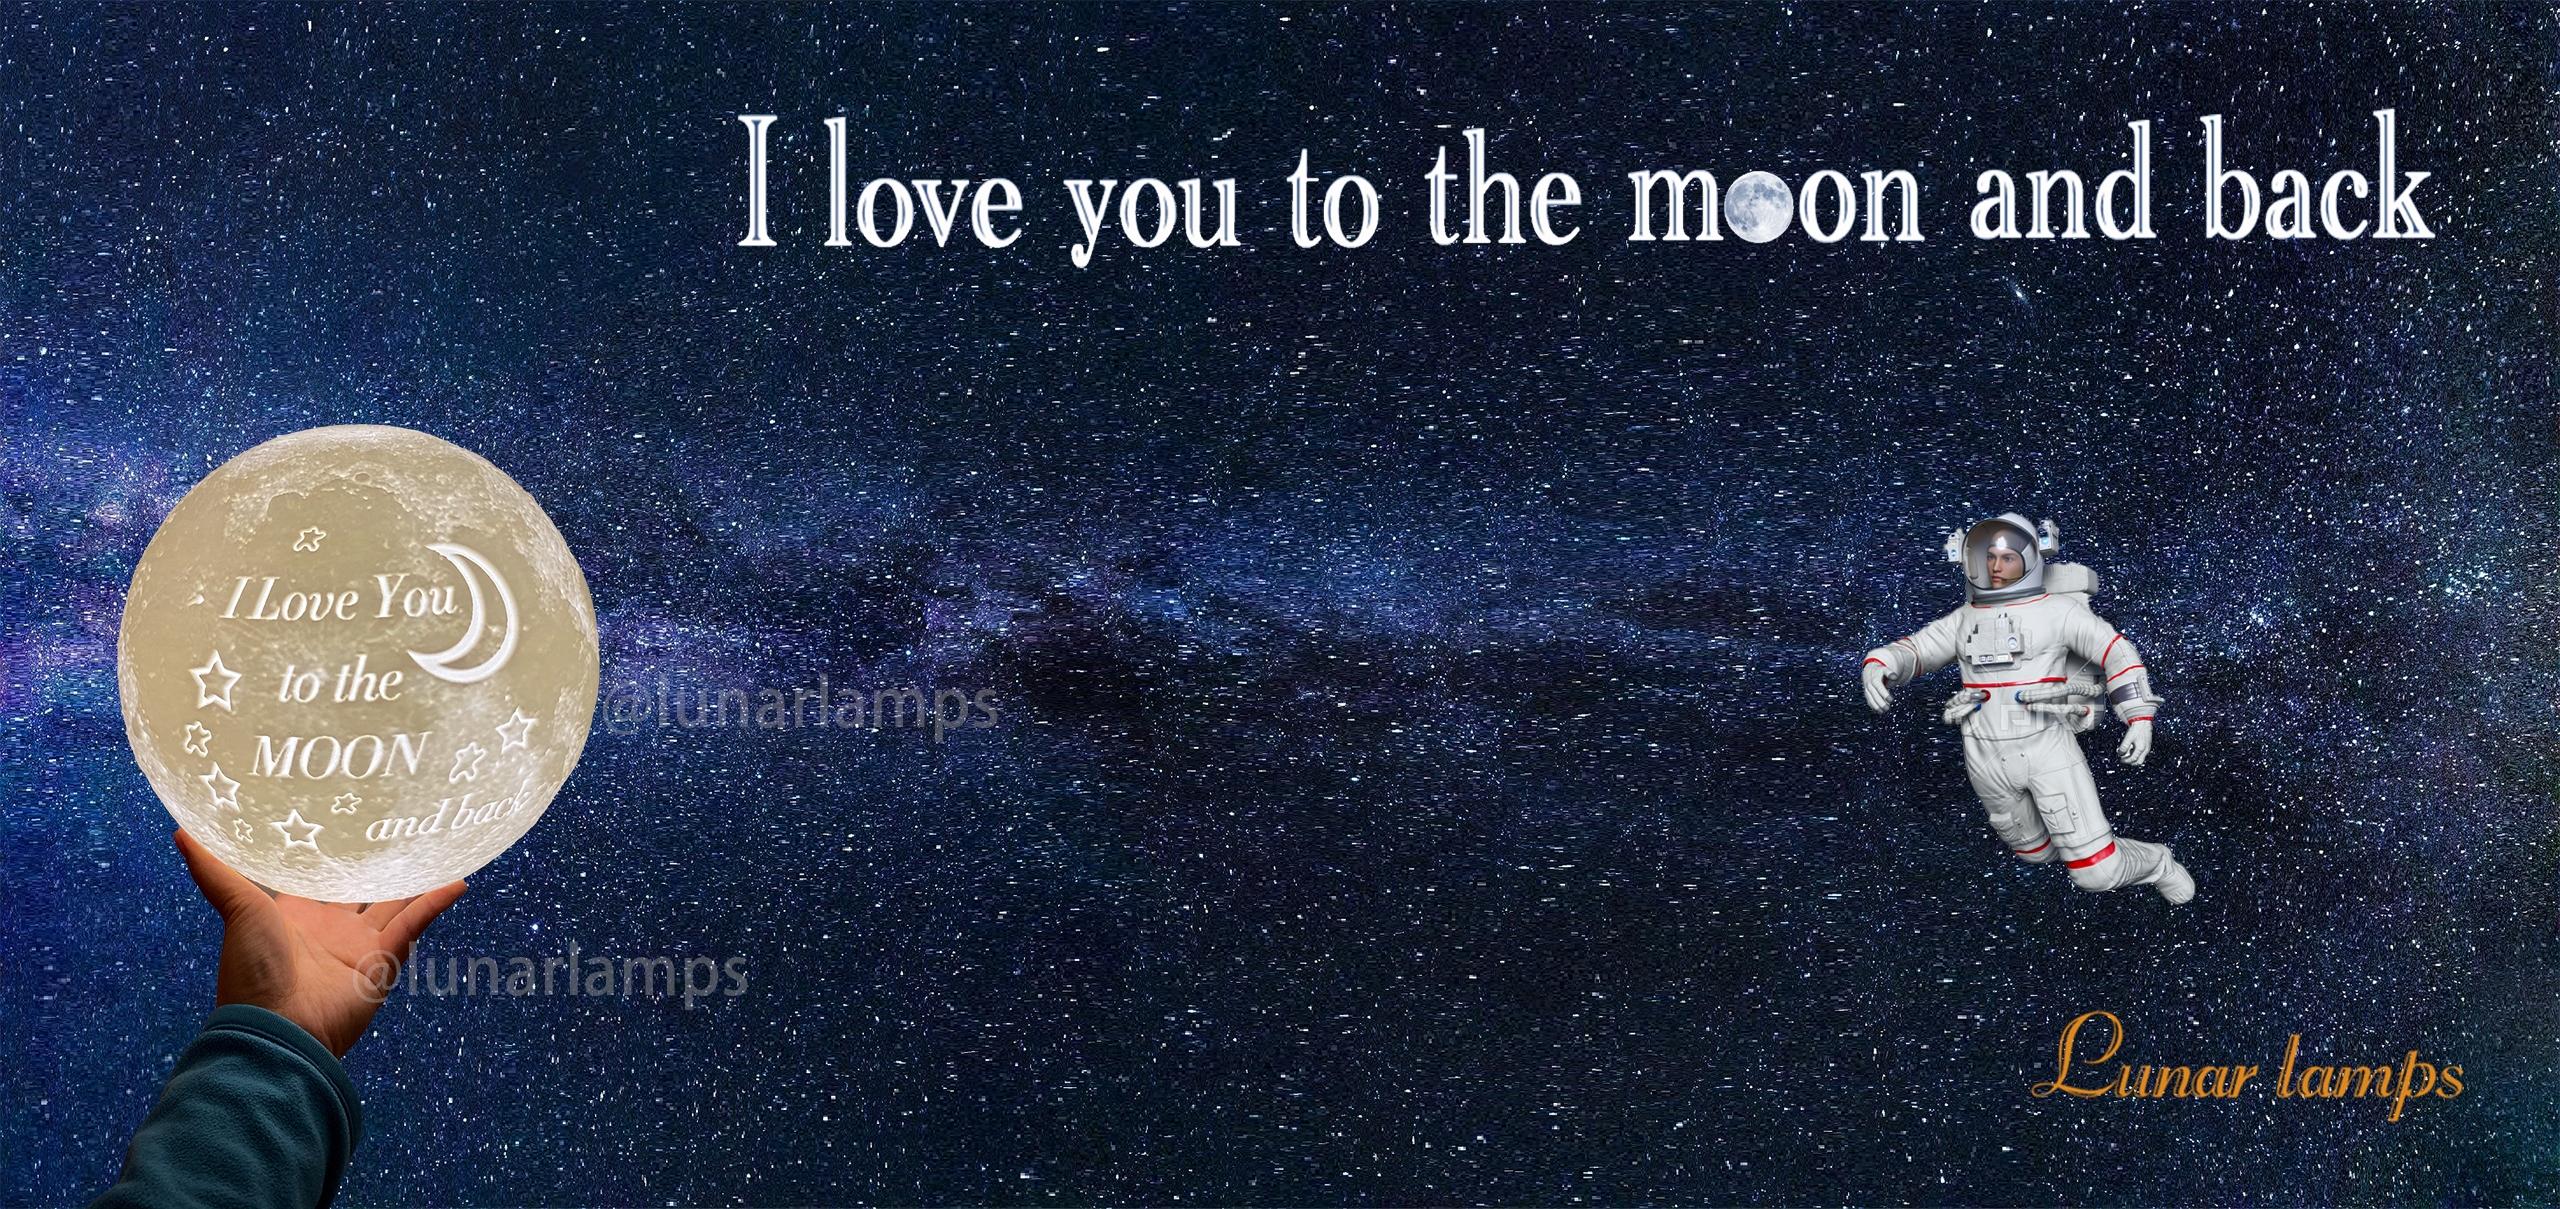 Lunar Lamps (@lunarlamps) Cover Image